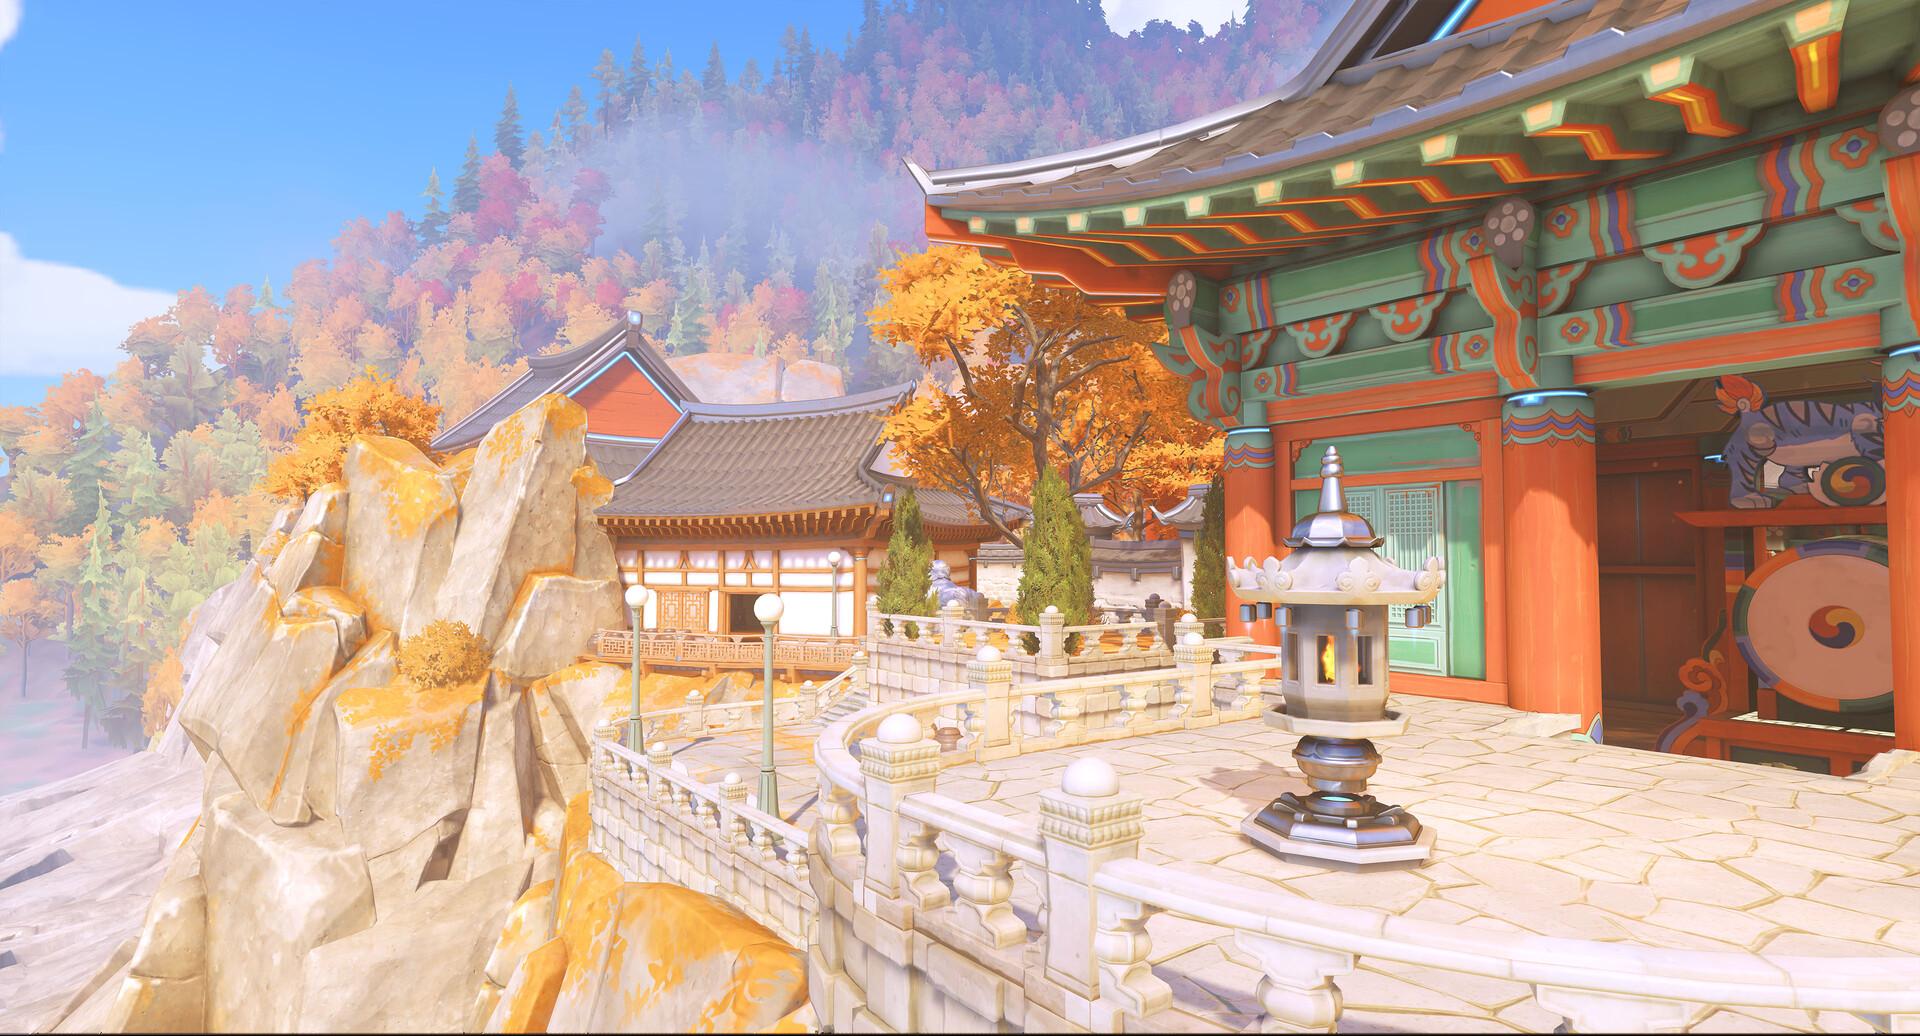 Helder pinto busan temple 12